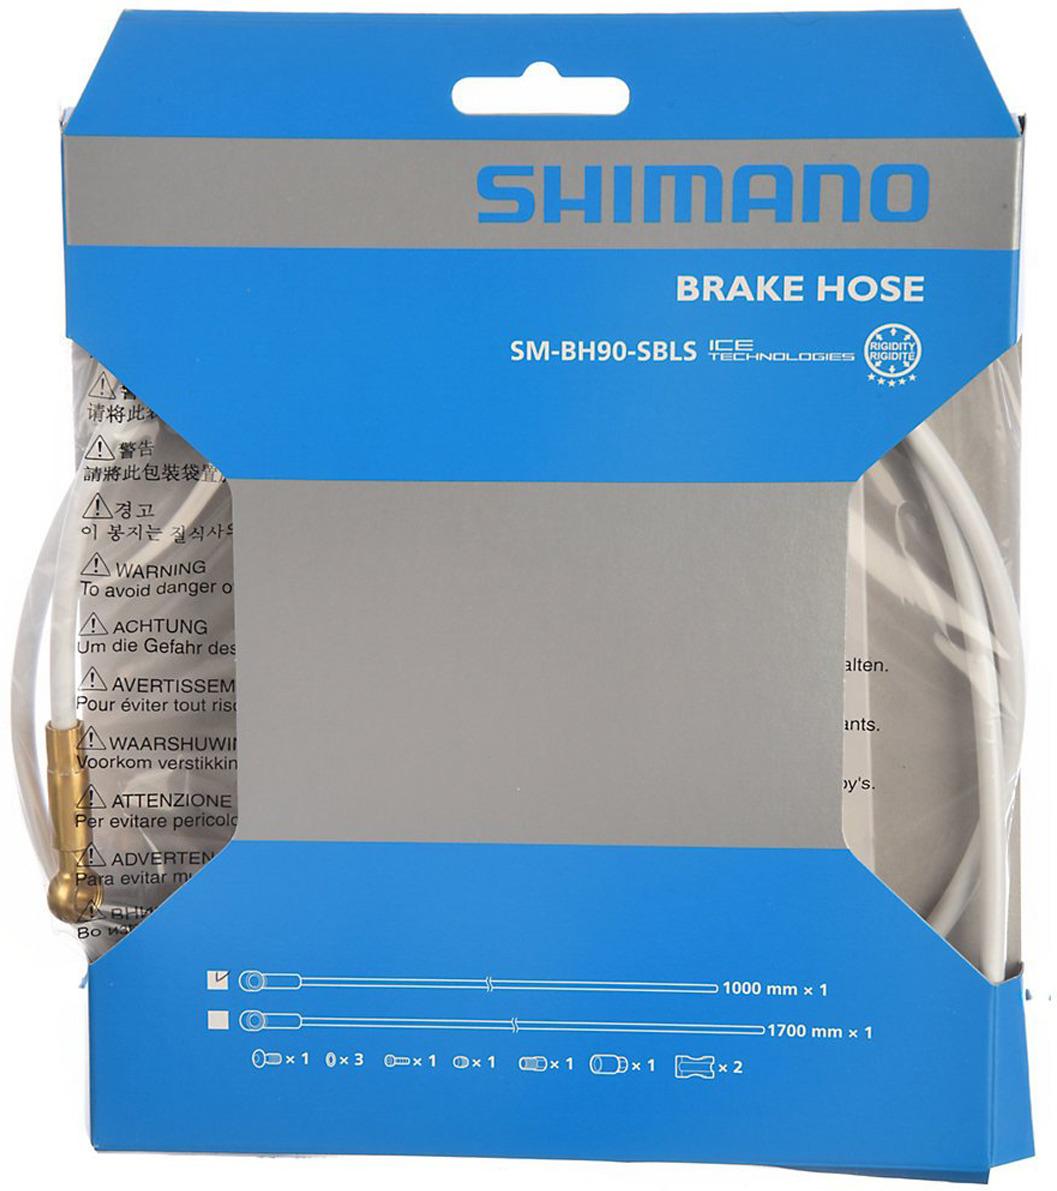 Гидролиния Shimano XTR, BH90-SBLS, 1000 мм, обрезной, TL-BH61, ISMBH90SBLSW100, белый комплект колес xtr m9000 tl f 15 r12мм e thru 29 c lock с lock ring арт ewhm9000lfere9x